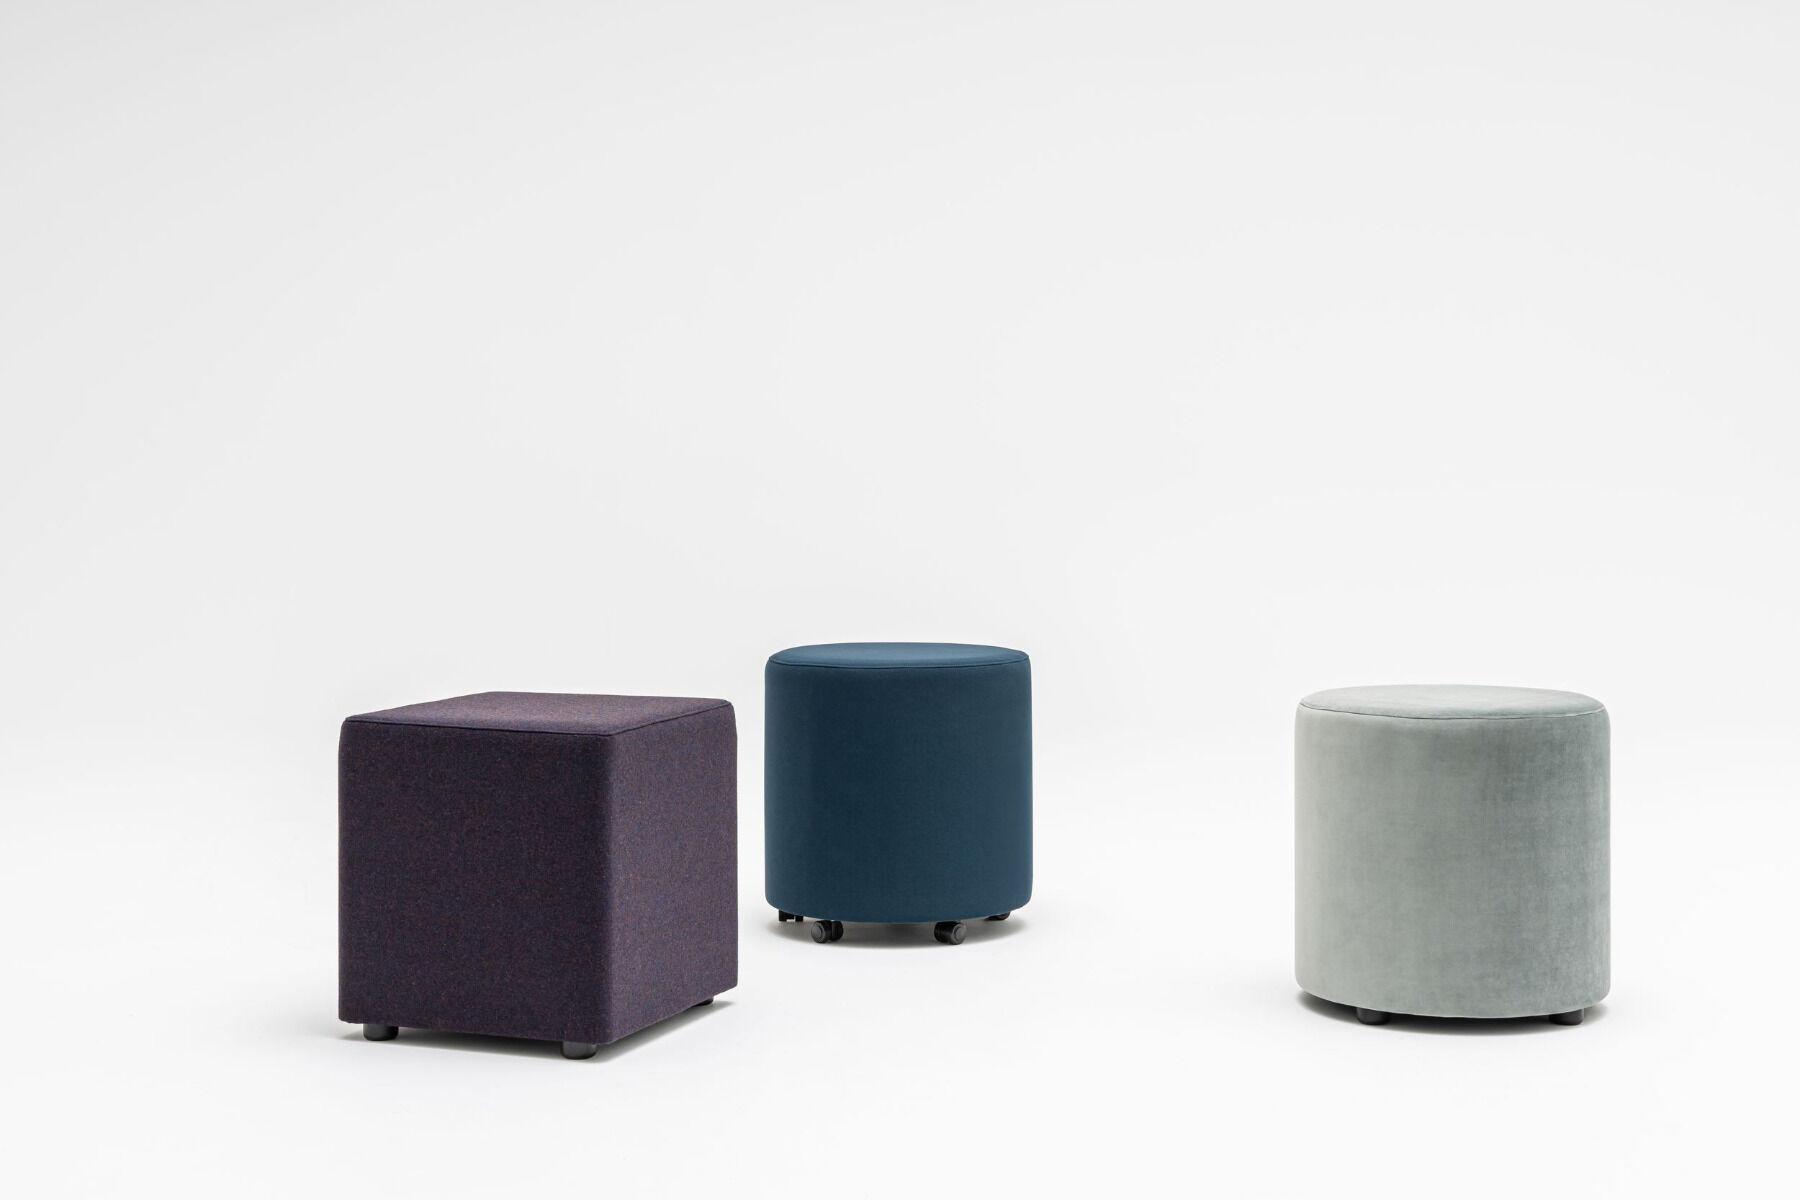 Mix pouf Fabric: Synergy, Atlantic, River Colour: Lds61, A66057, Rv34